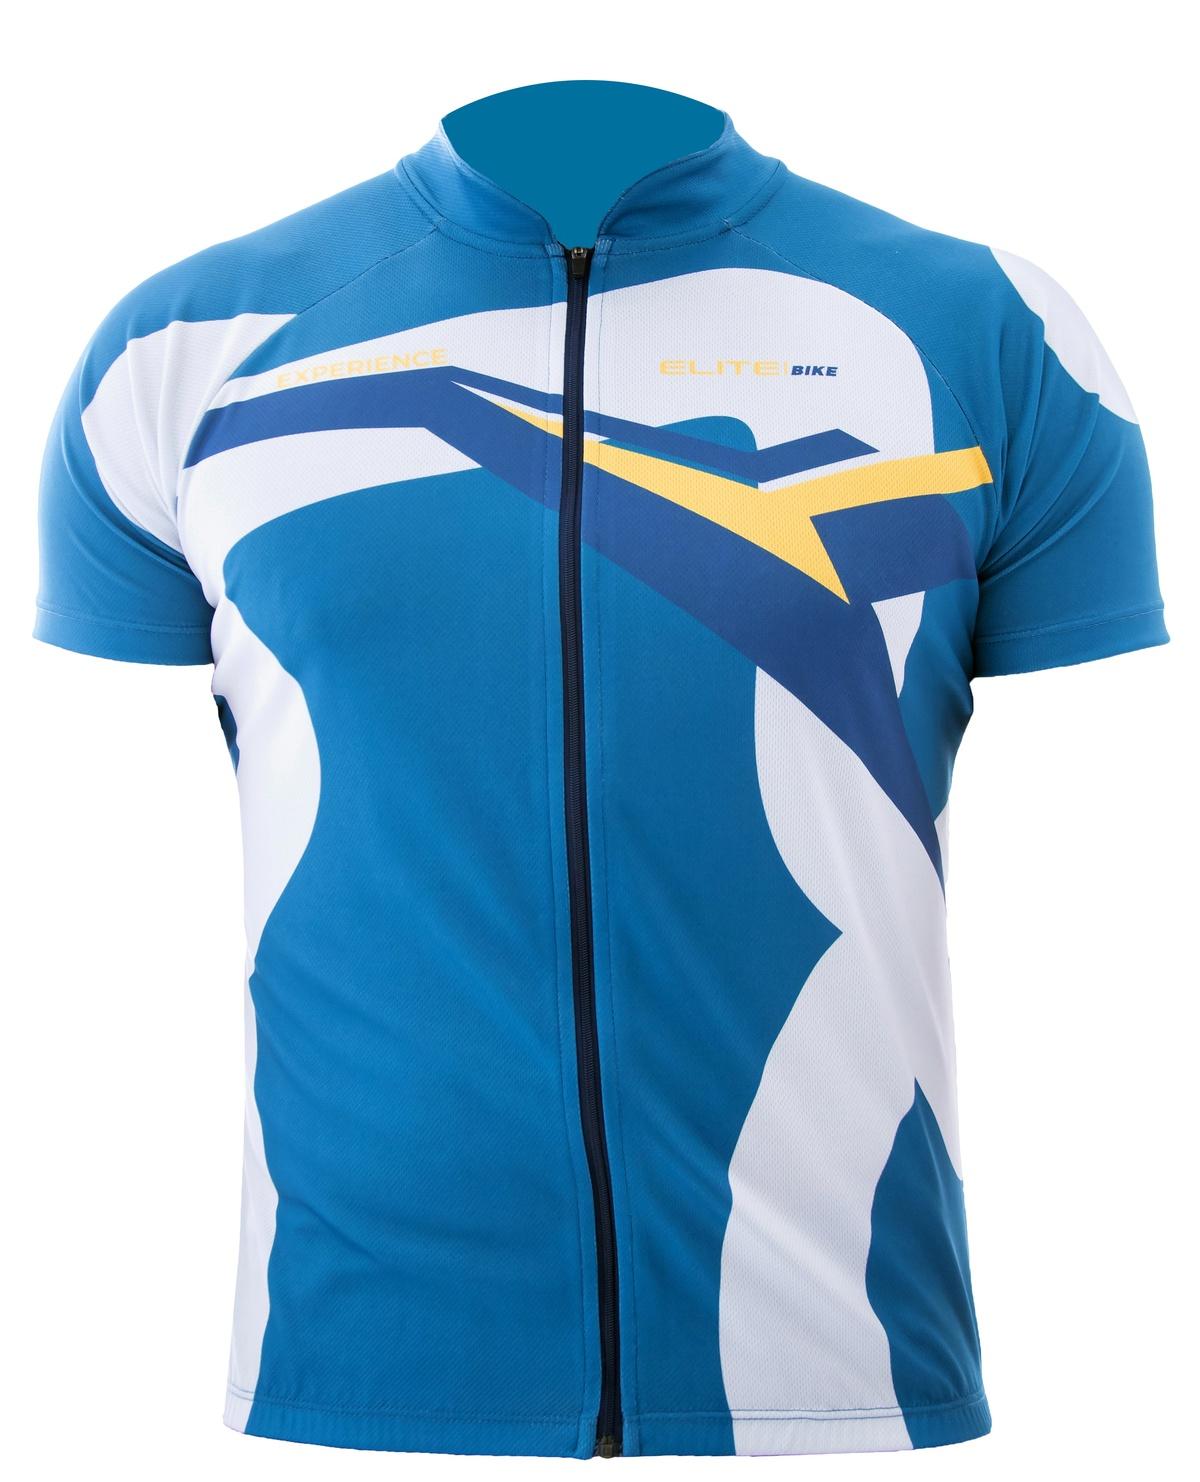 Camiseta Elite Azul Uv 50 Ciclismo Bike